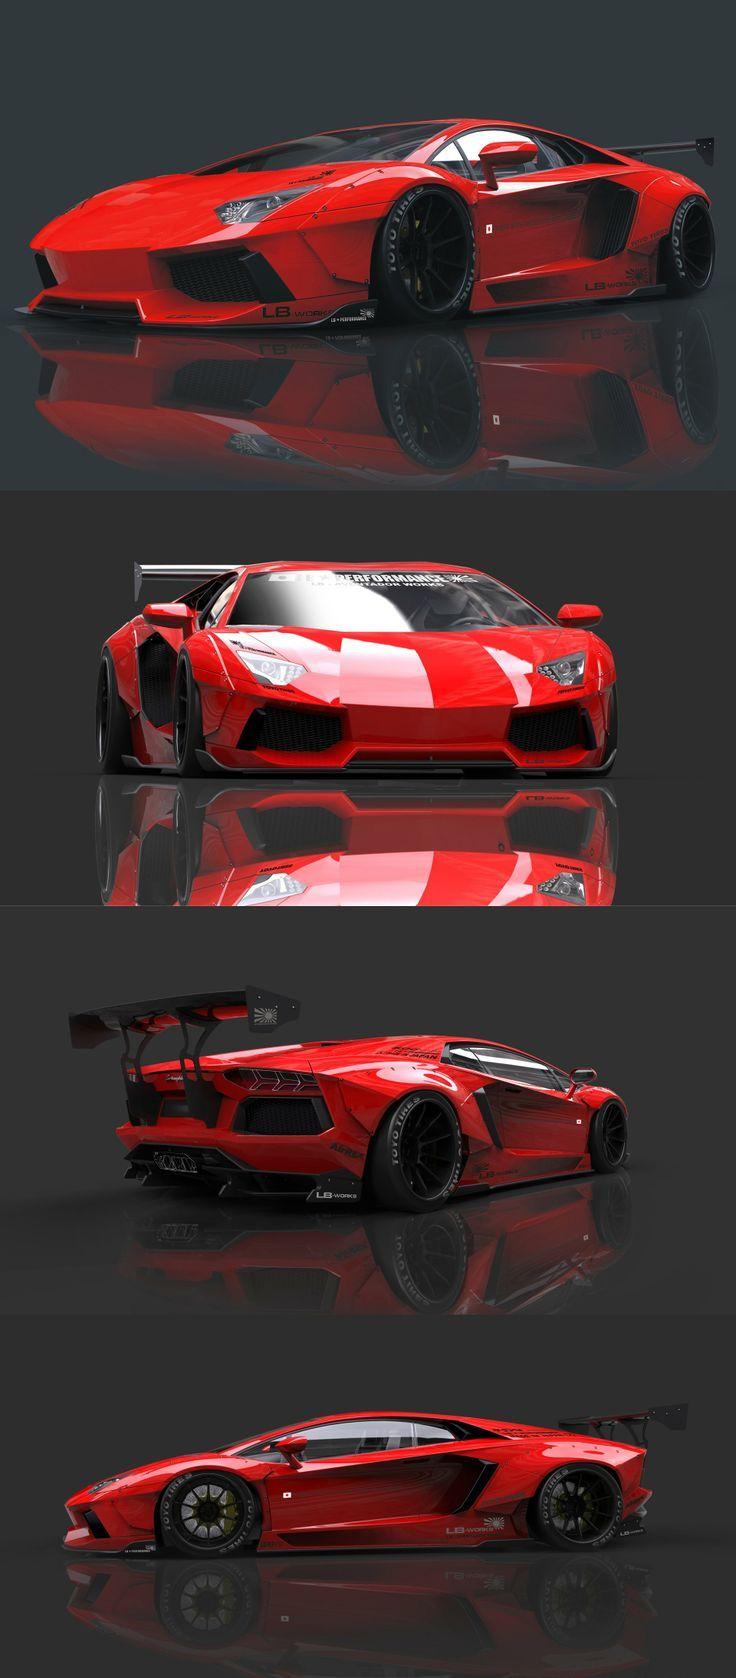 Liberty Walk Lamborghini Aventador. Hot or Not? You decide... #TinderforCars